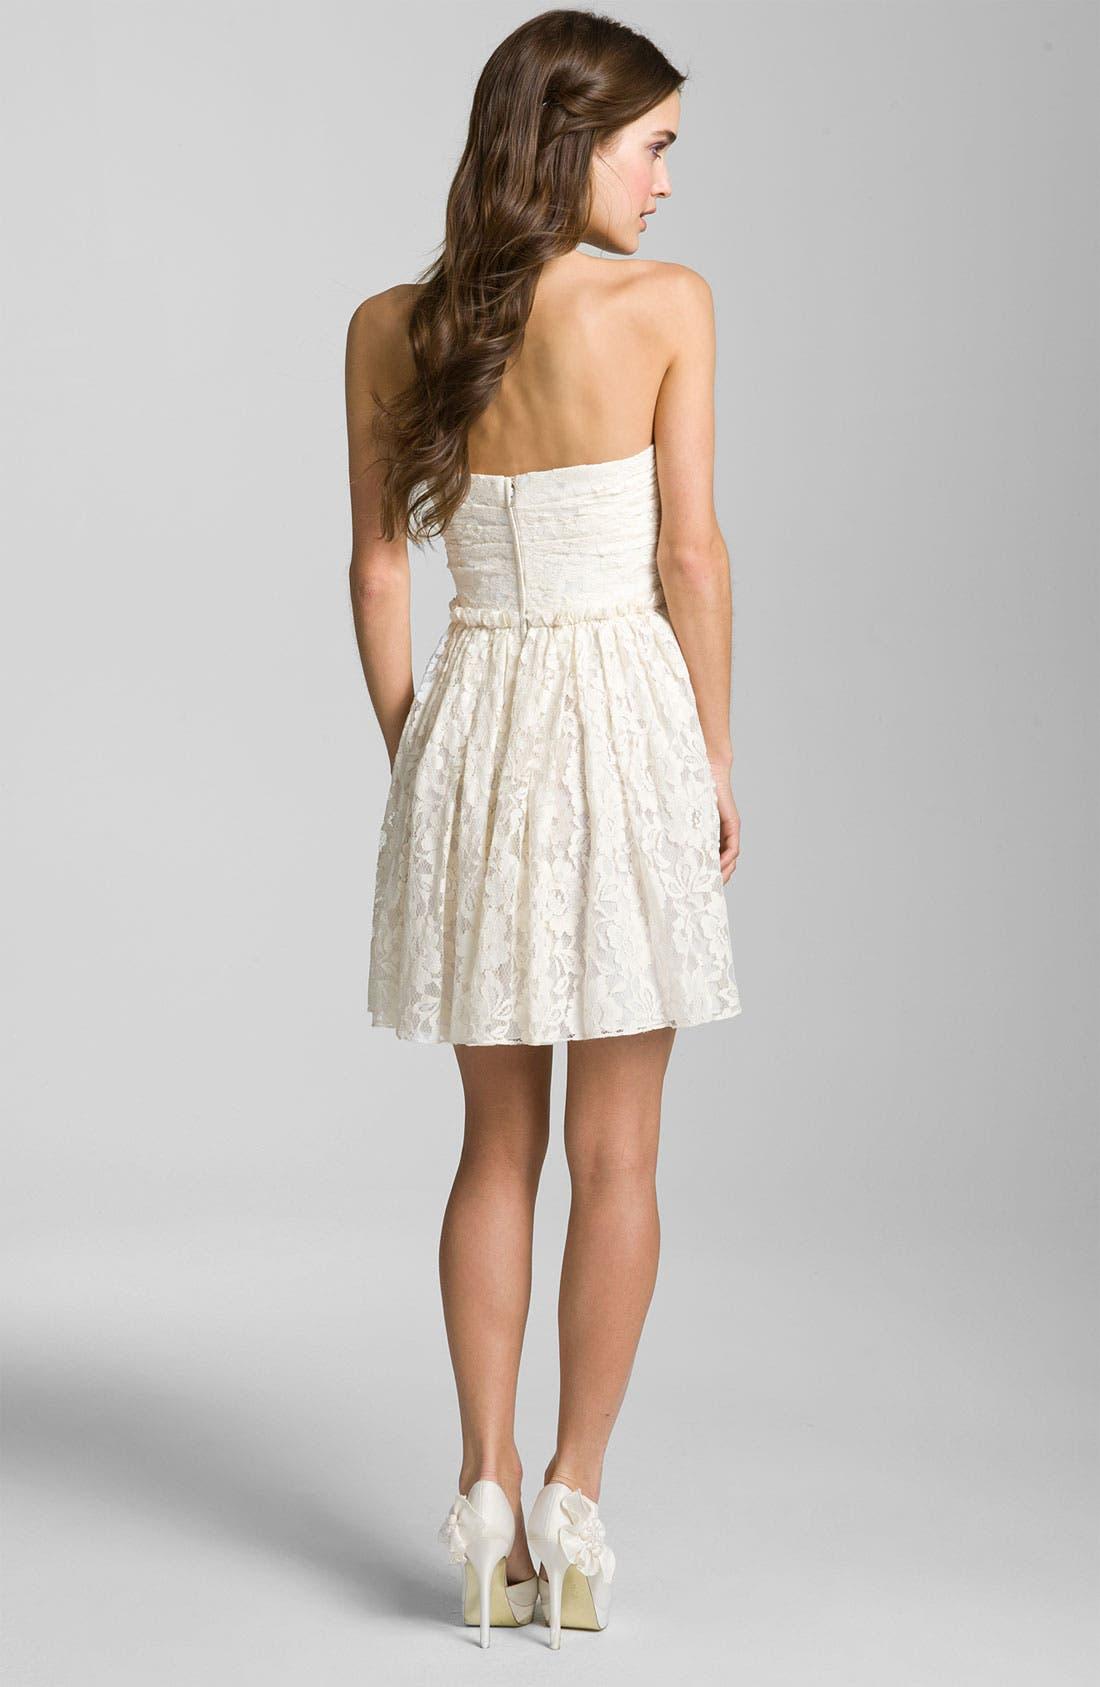 Sweetheart Lace Dress,                             Alternate thumbnail 4, color,                             900